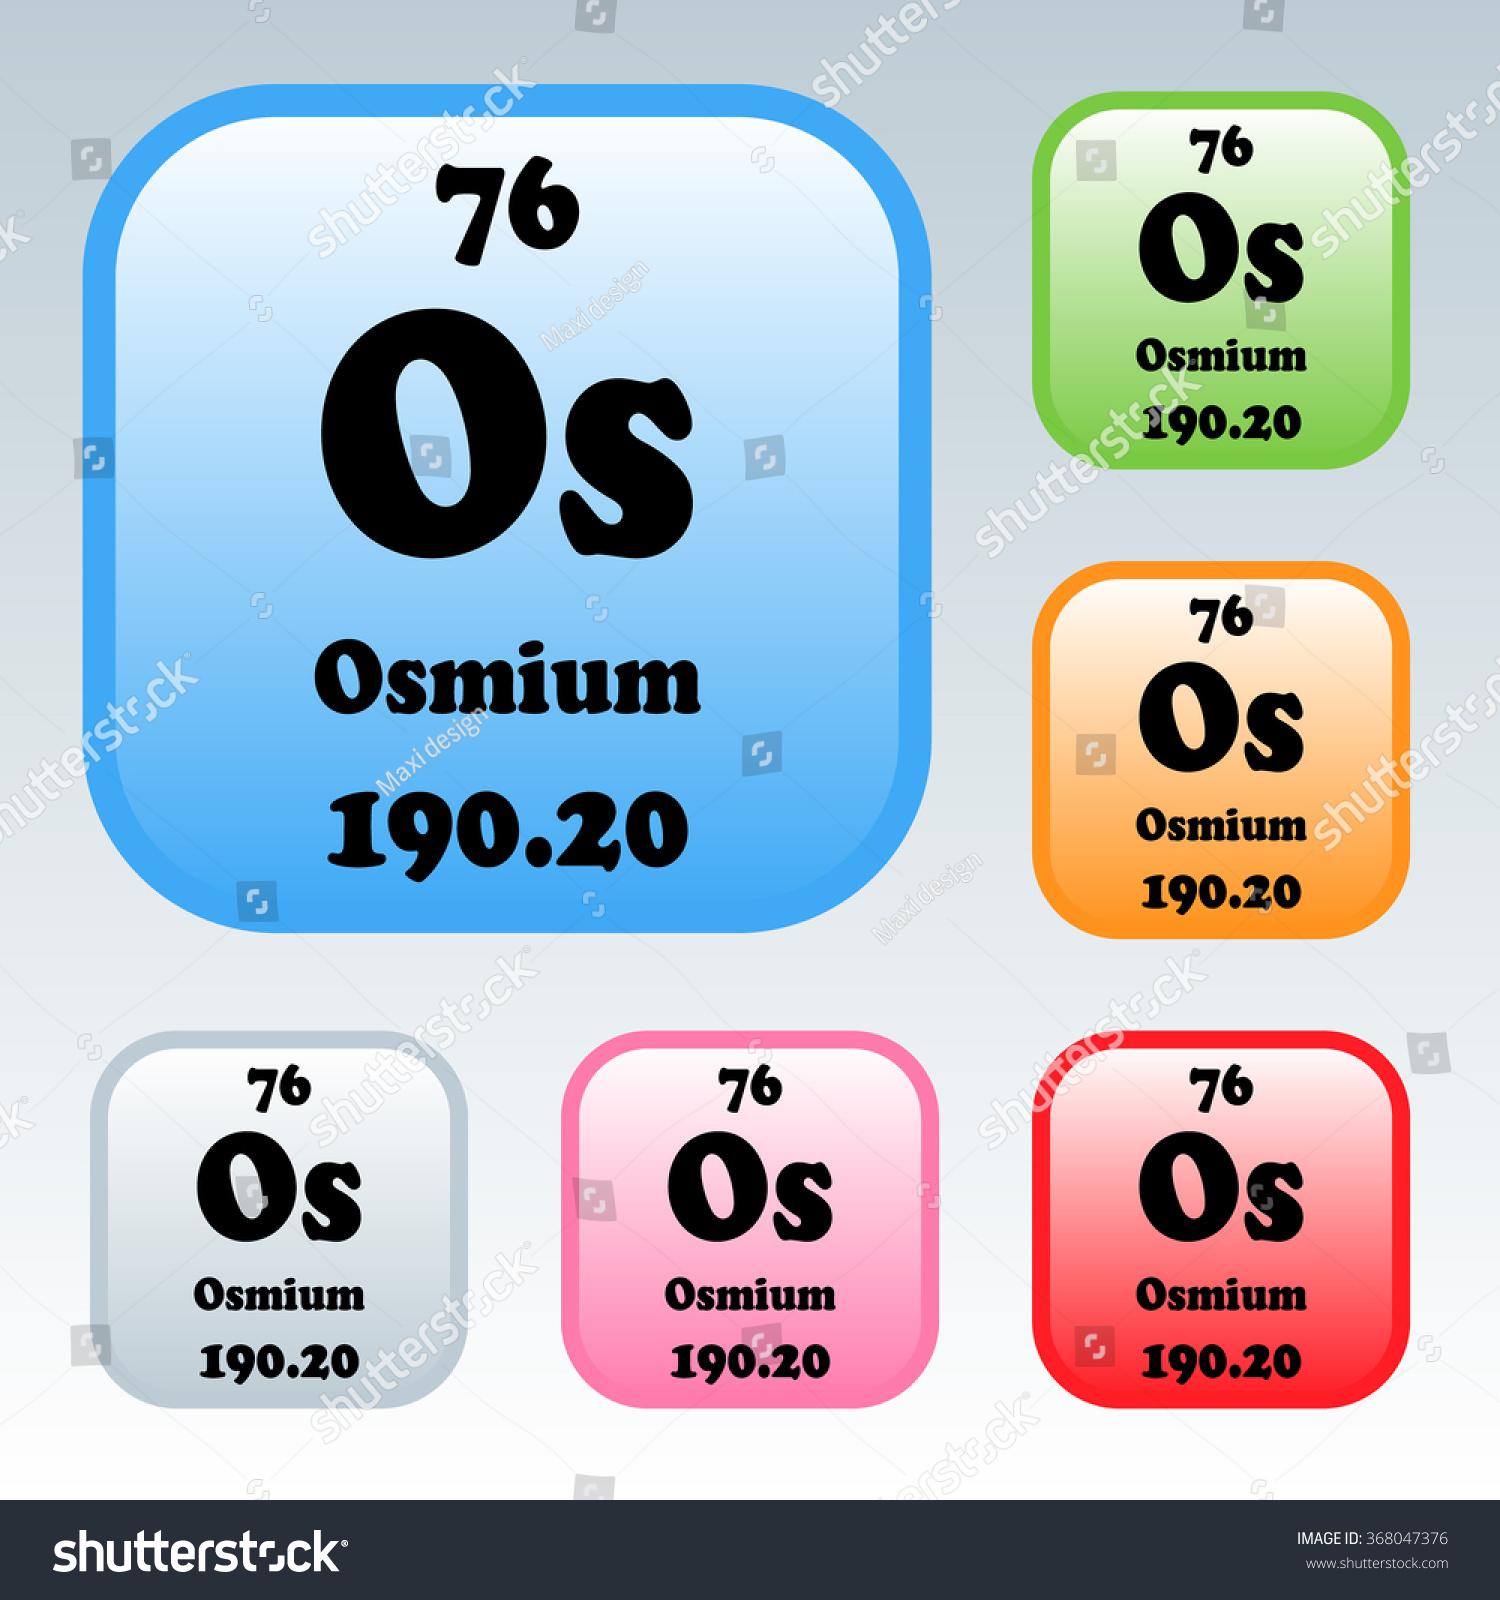 Periodic table elements osmium stock vector 368047376 shutterstock the periodic table of the elements osmium urtaz Images